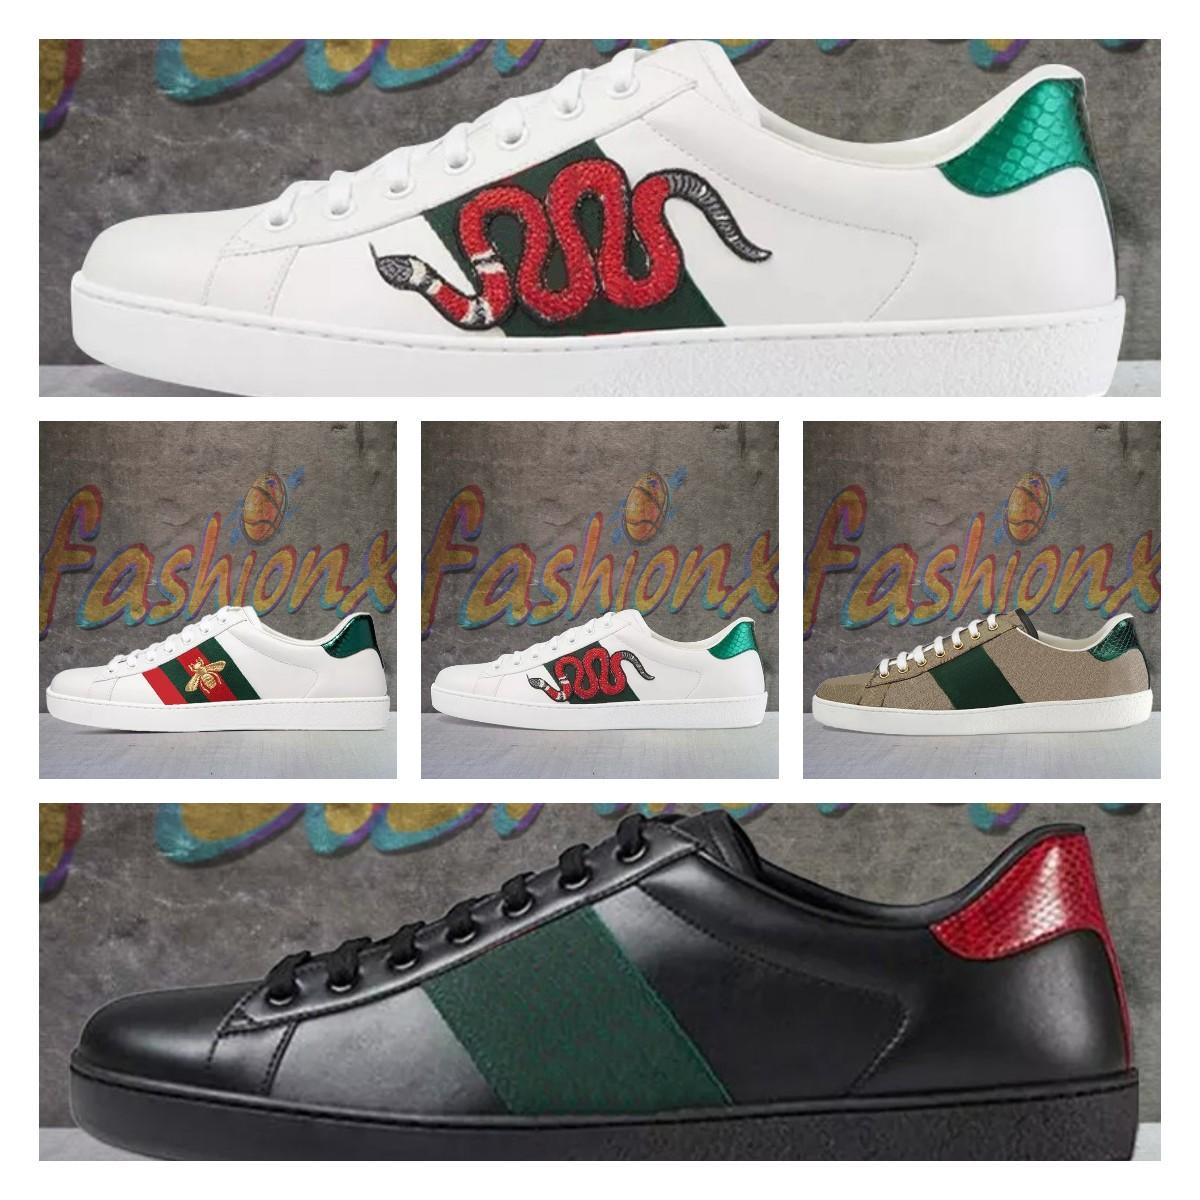 Dunk Chunky Dunky Low sb Men's Women's Casual Shoes FRAME HABIBI men WHAT THE PAUL BEN YELLOW BEAR HOLIDAY HYPER ROYAL BLACK WomenOutdoor Sports Shoe